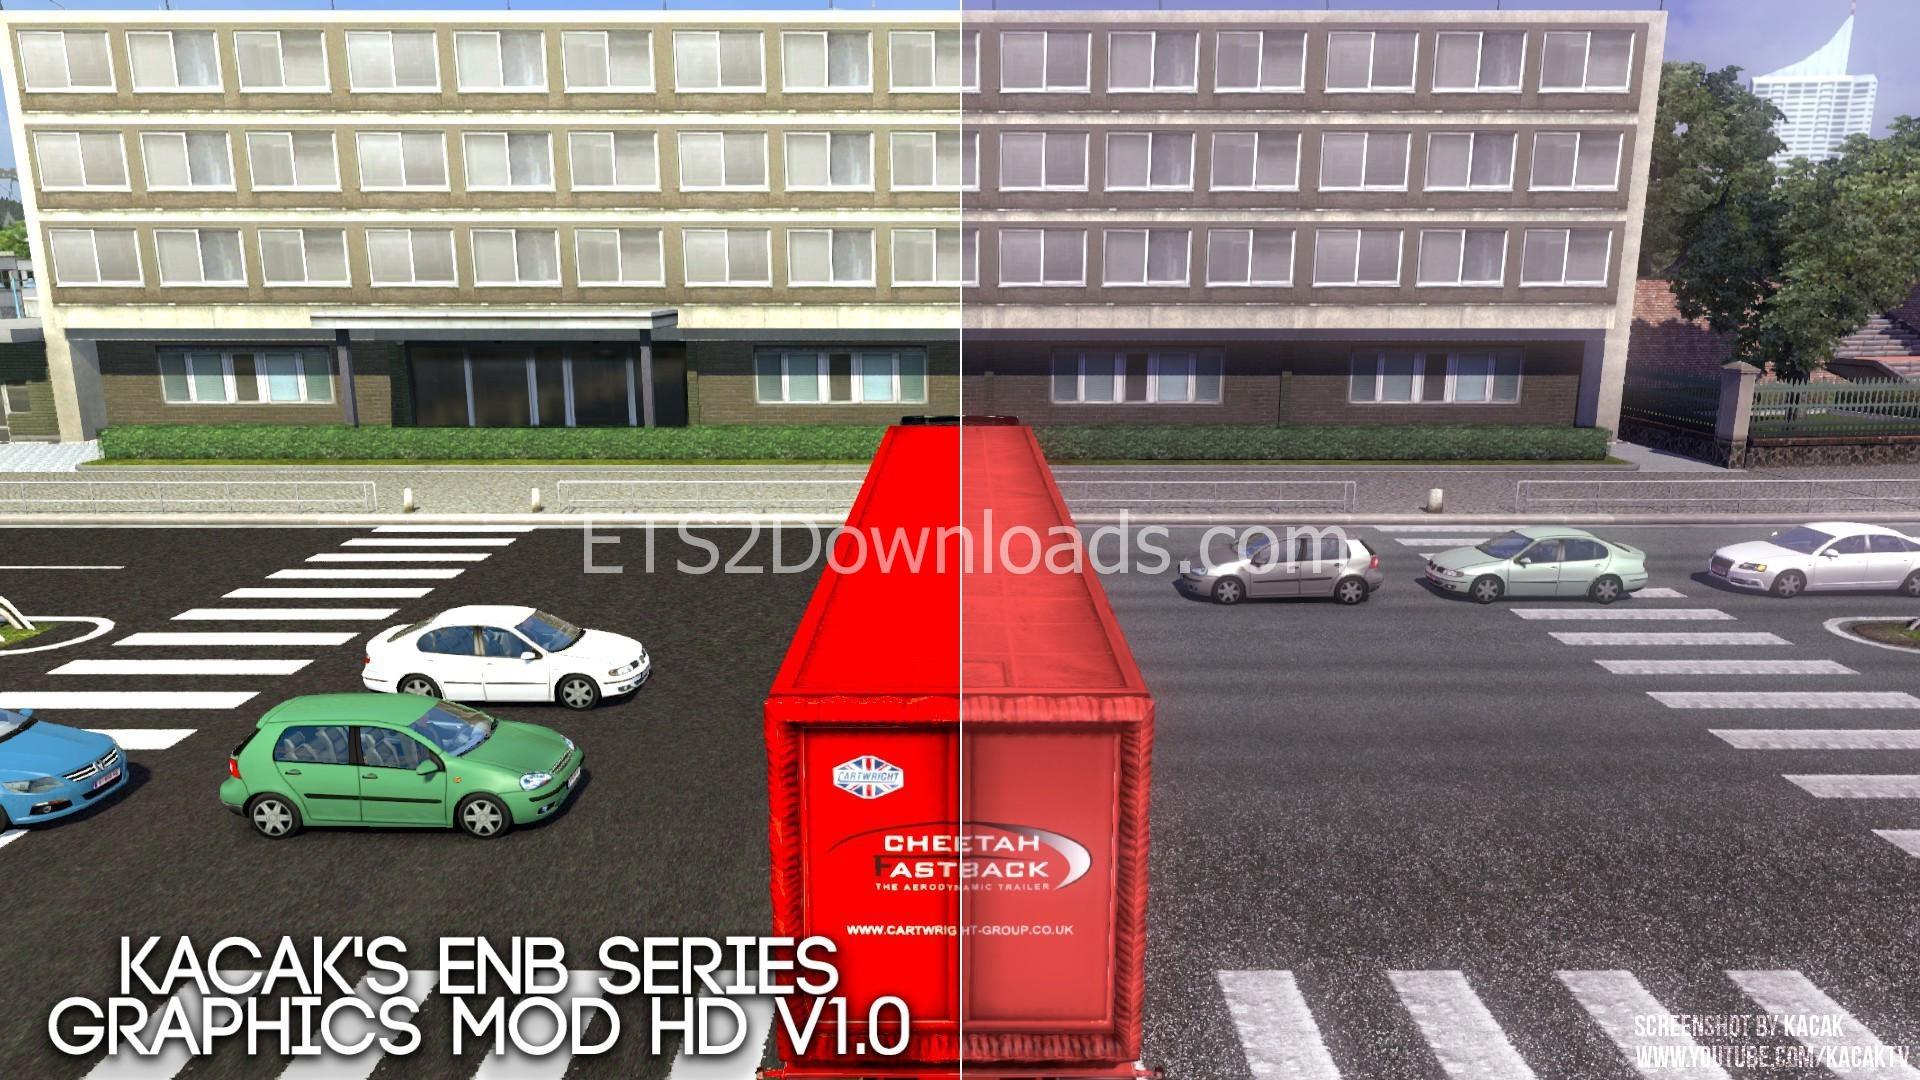 kacaks-enb-series-graphics-mod-hd-ets2